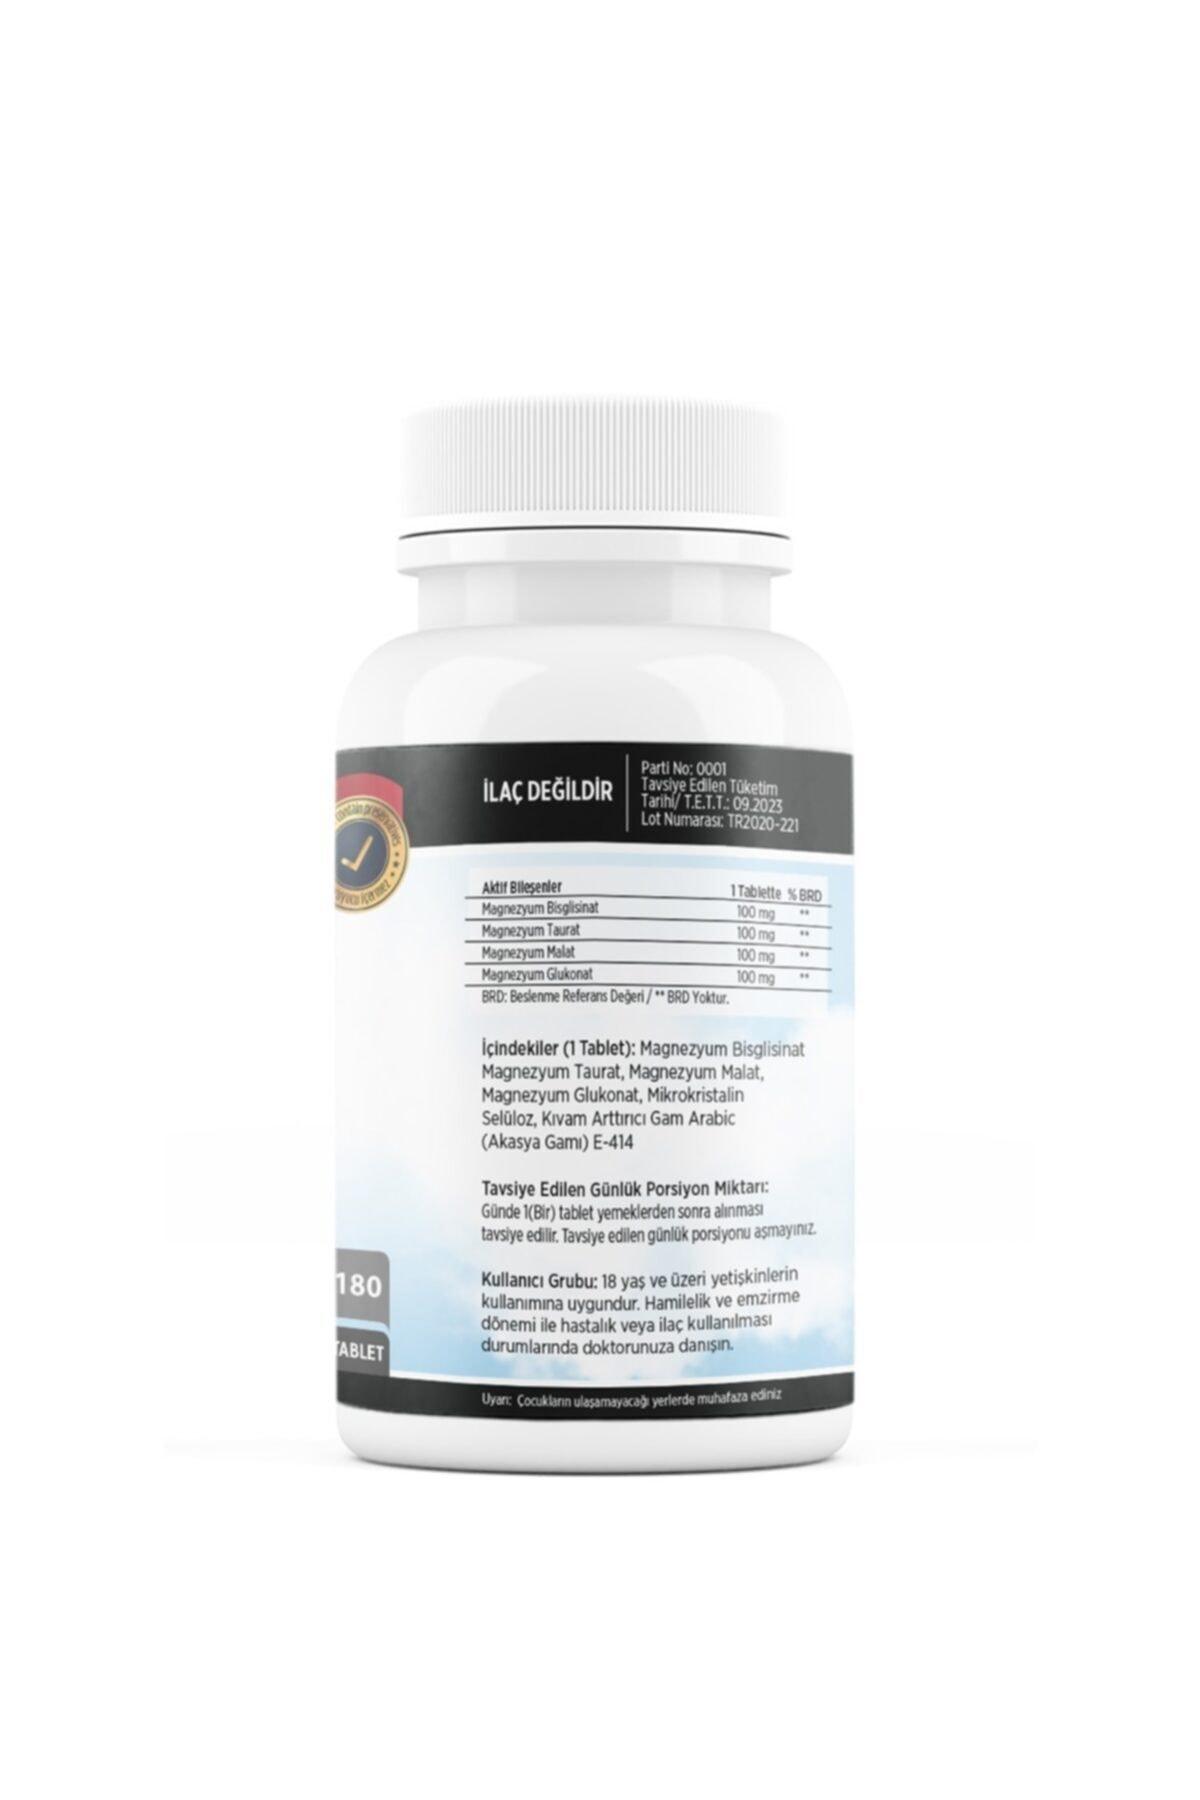 FLX Magnesium Bisglisinat Malat Taurat Glukonat 180 Tablet Magnezyum 2